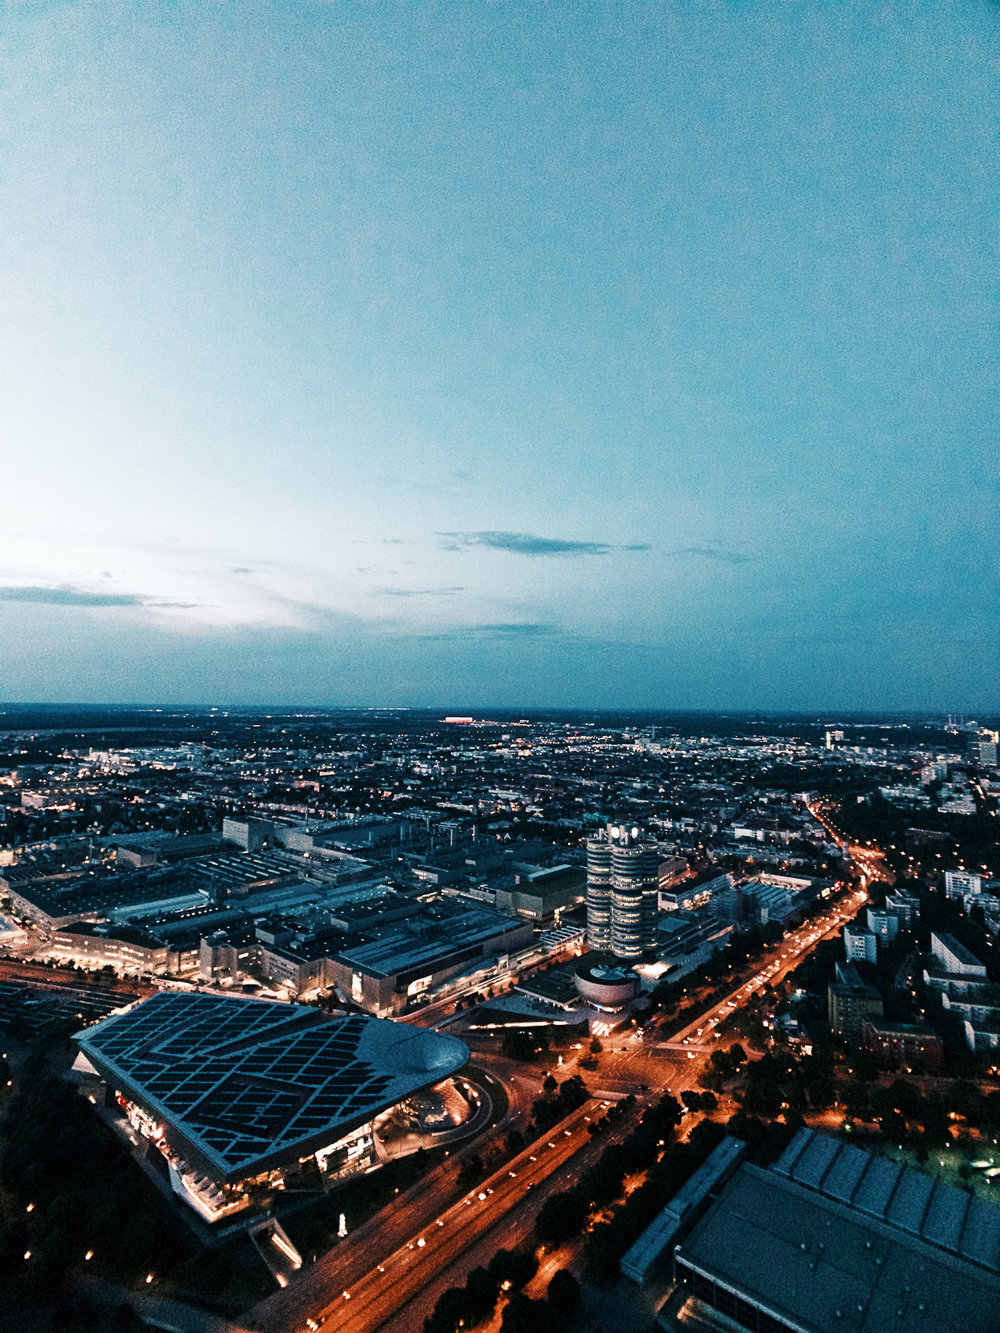 bitplay Olympiapark Tower | Y!PE 關於德國生活與旅遊的社群媒體-11.jpg